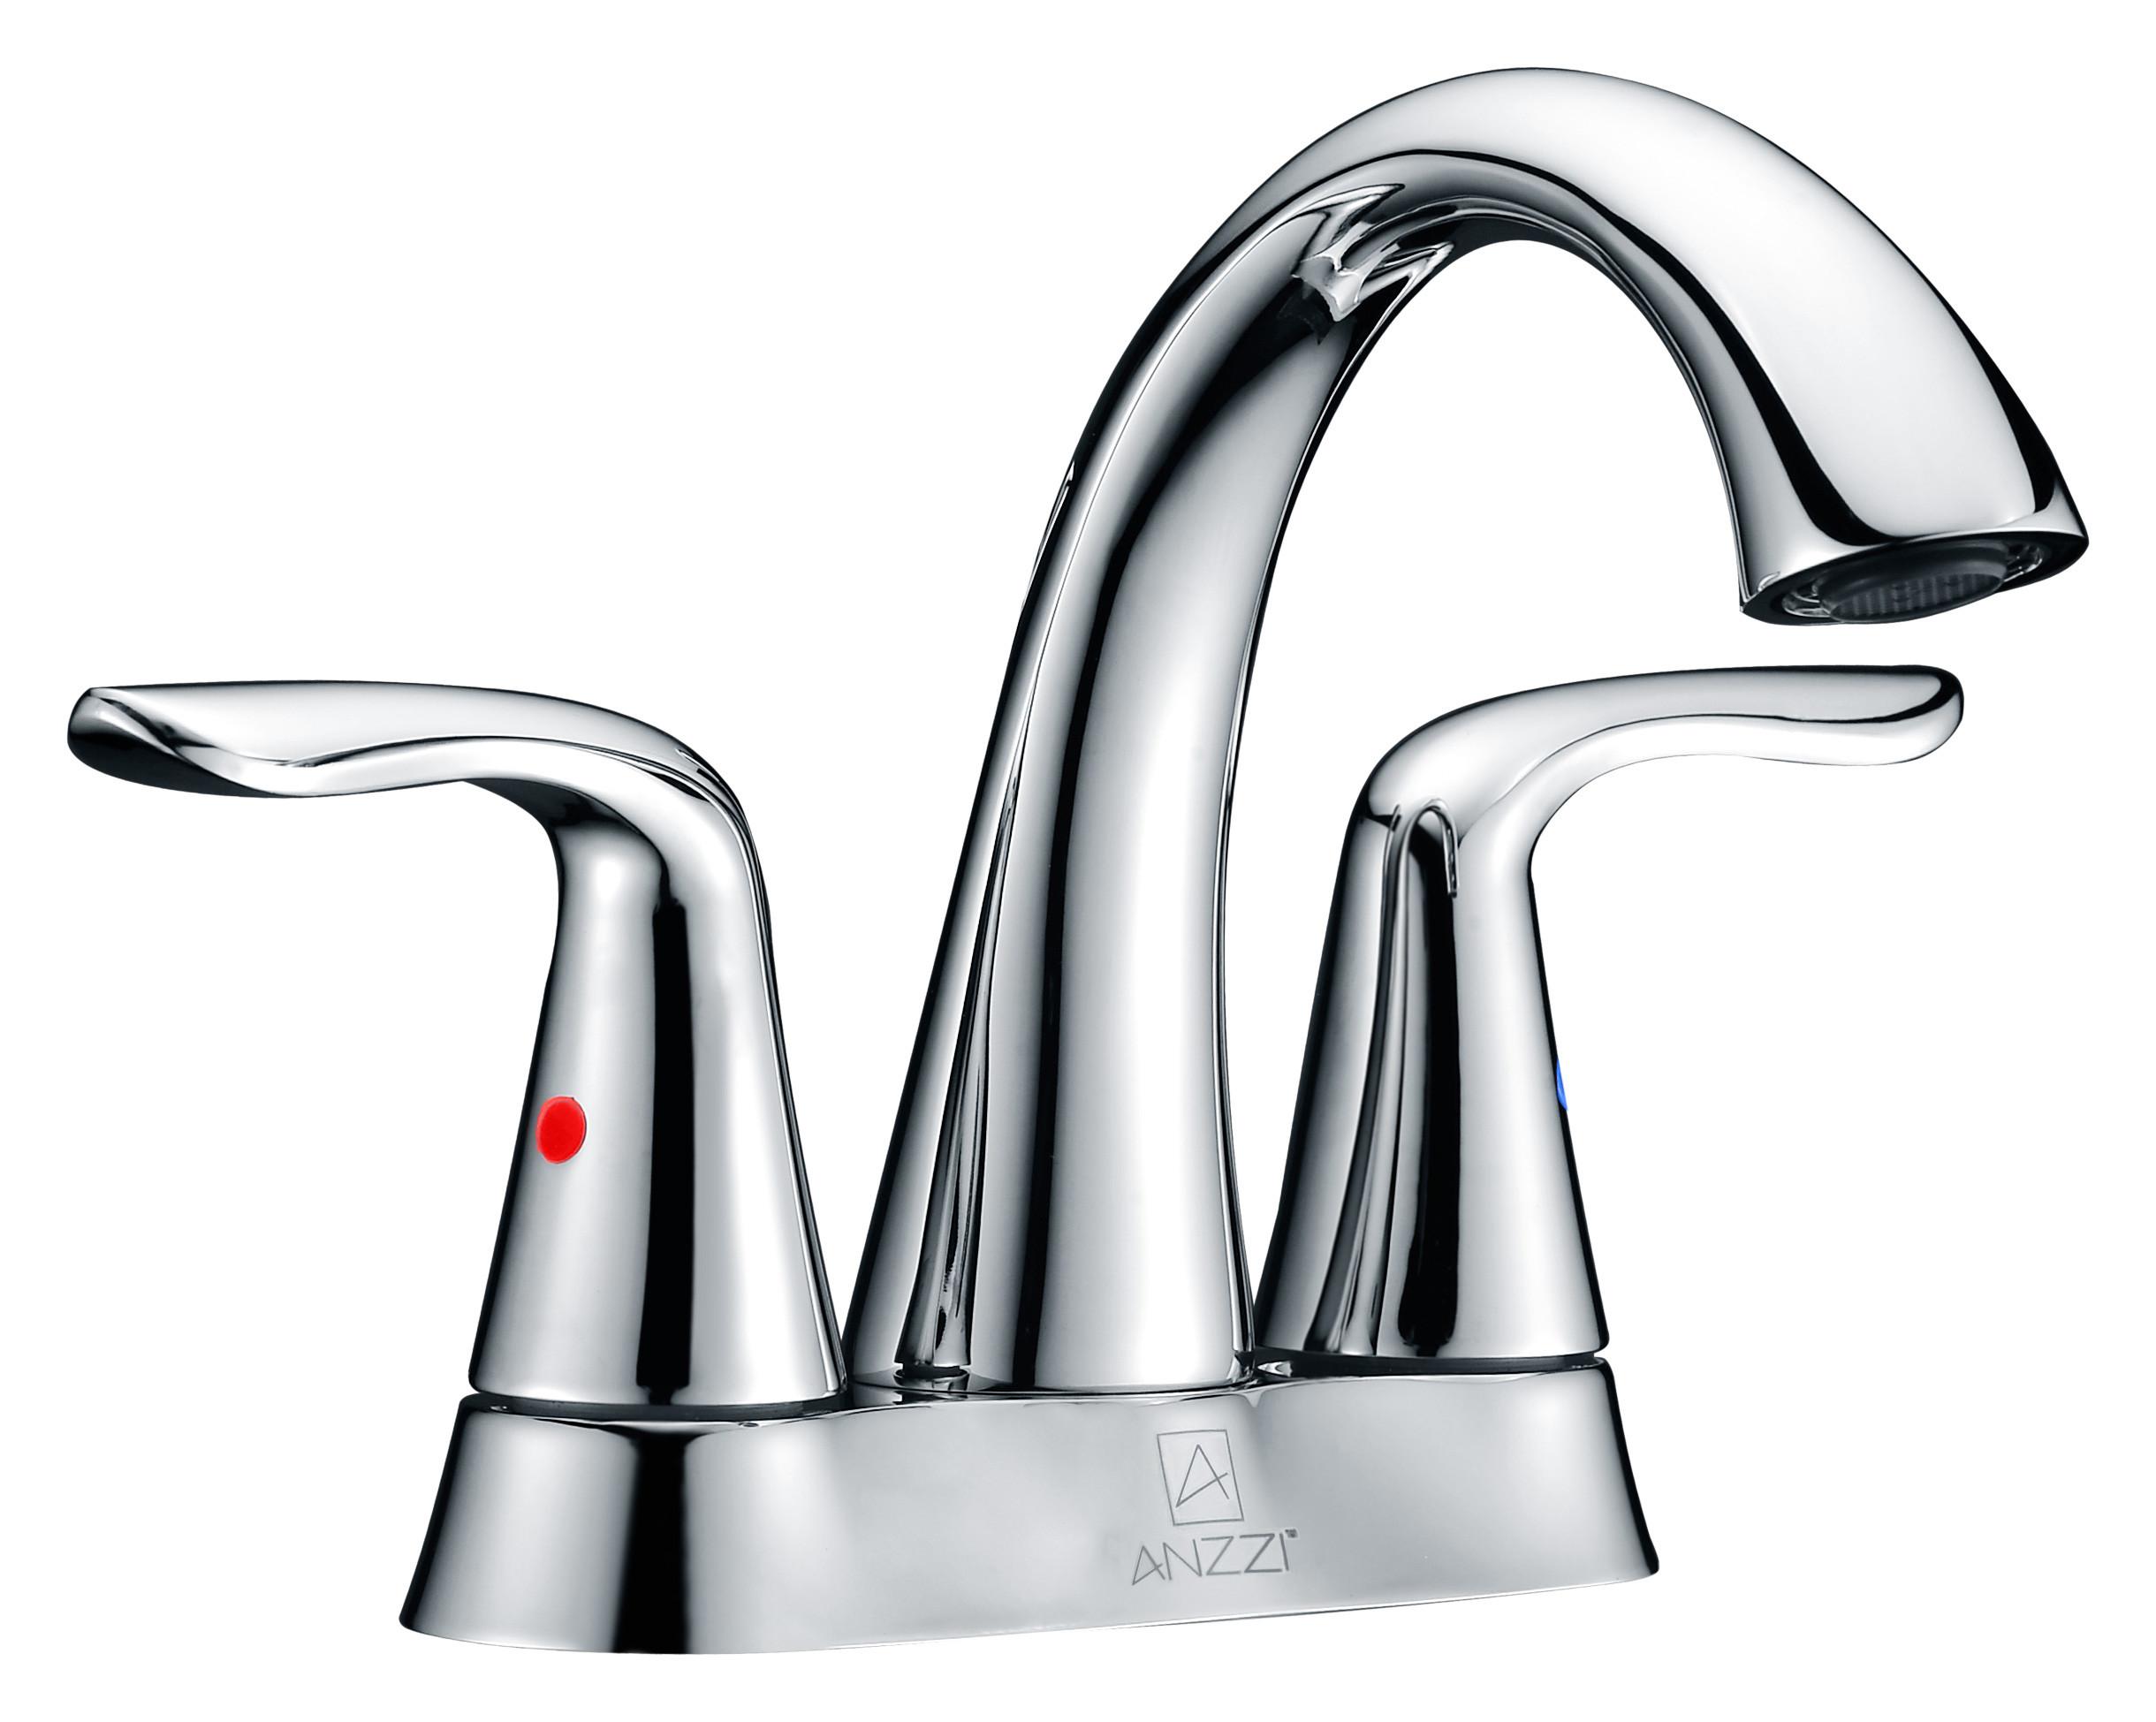 ANZZI L-AZ003 Cadenza Series Centerset High-Arc Faucet In Polished Chrome